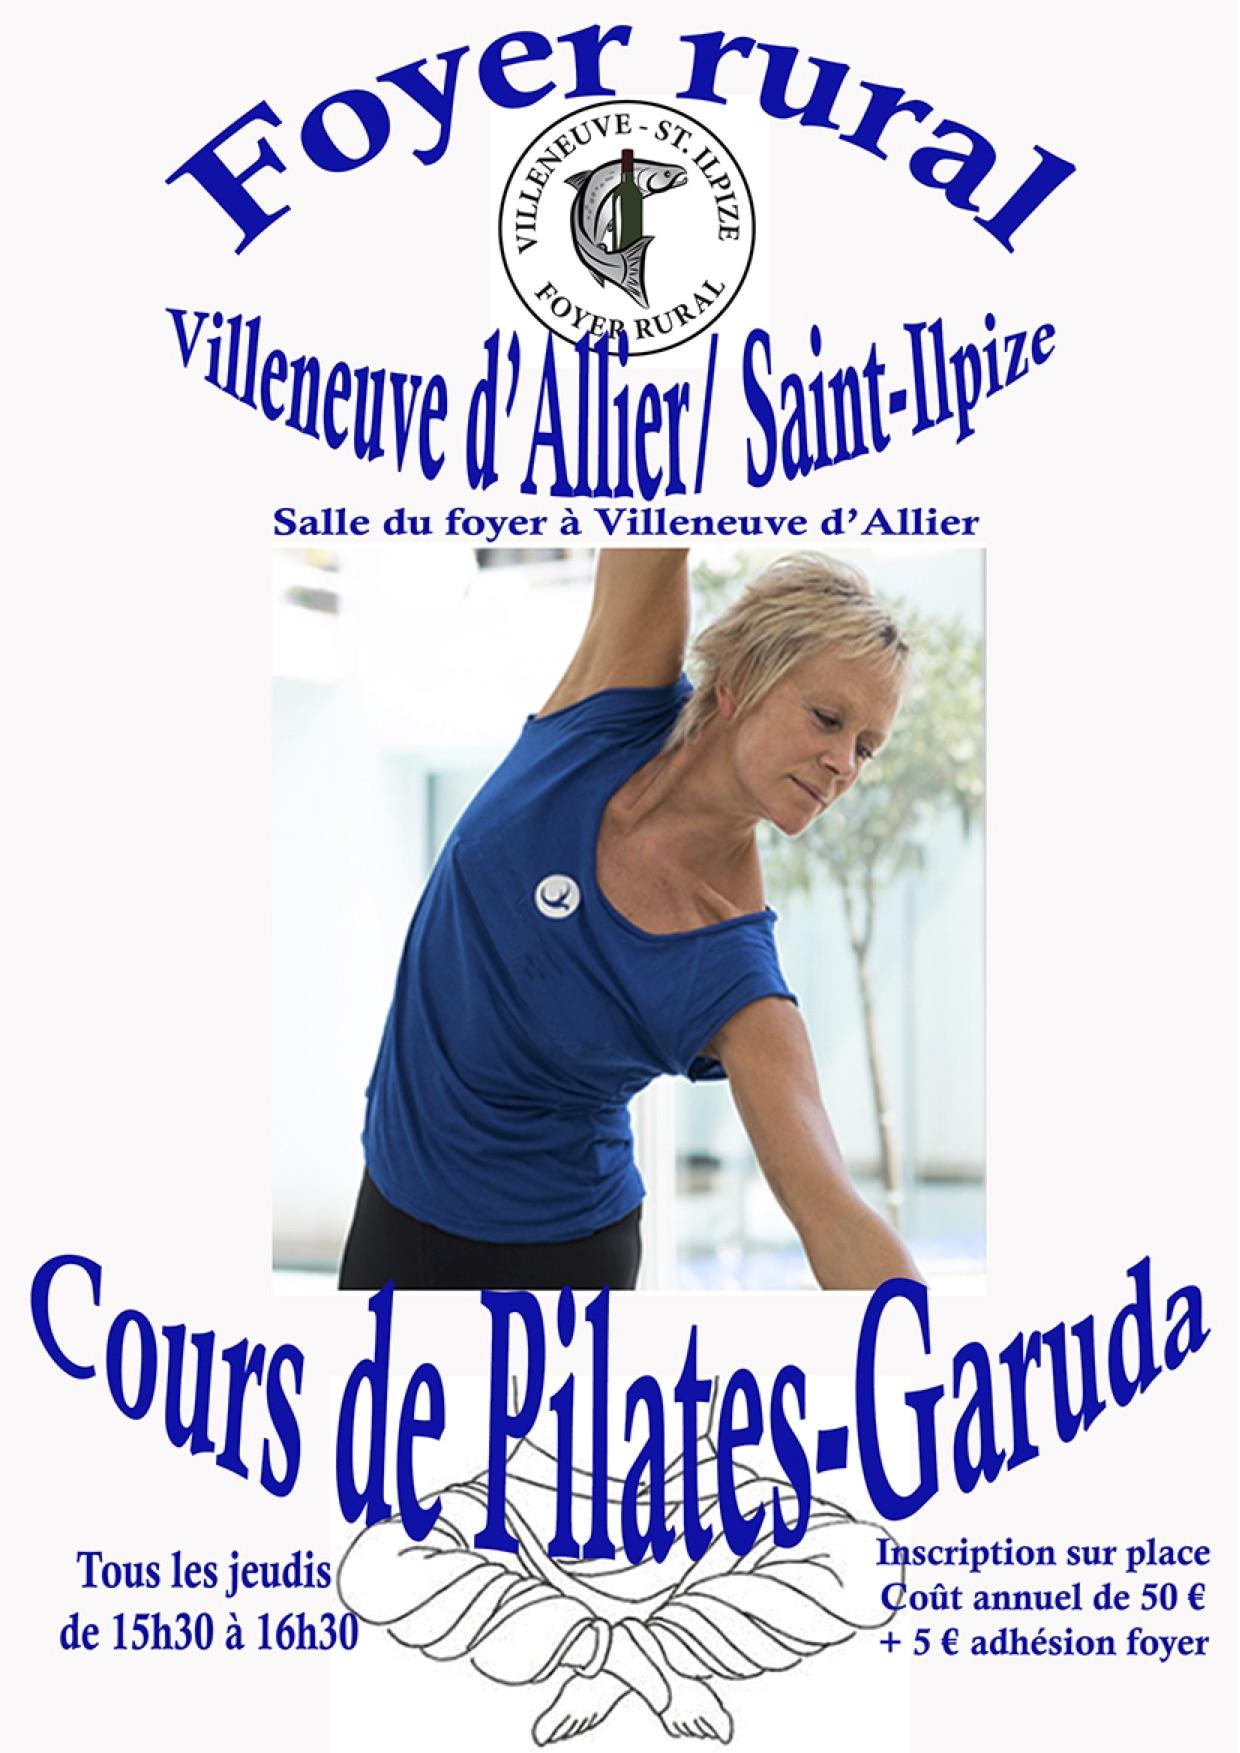 Reprise des cours de Pilates Garuda